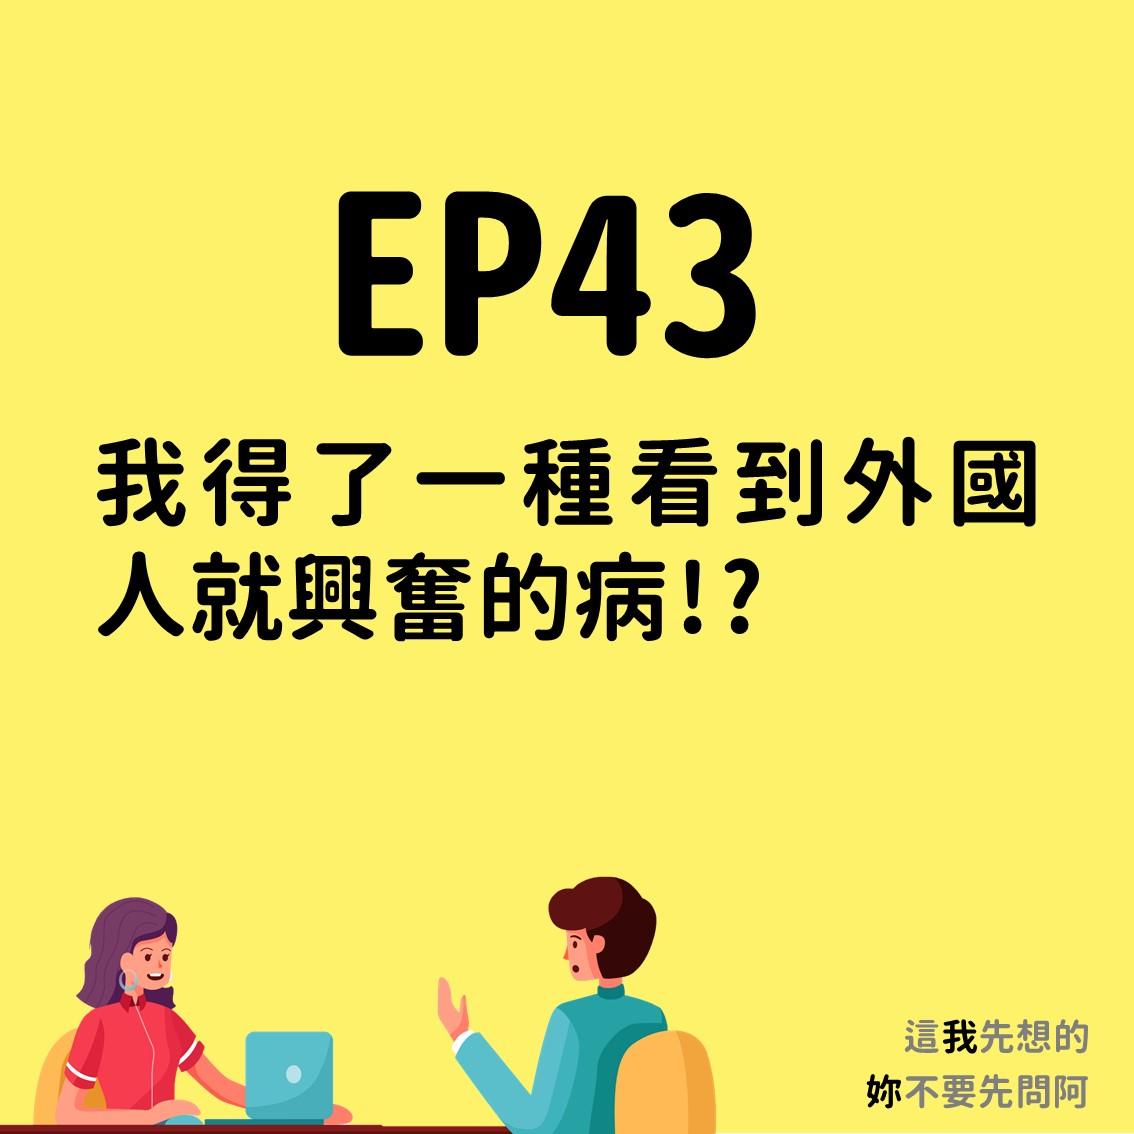 EP43 我得了一種看到外國人就興奮的病!?